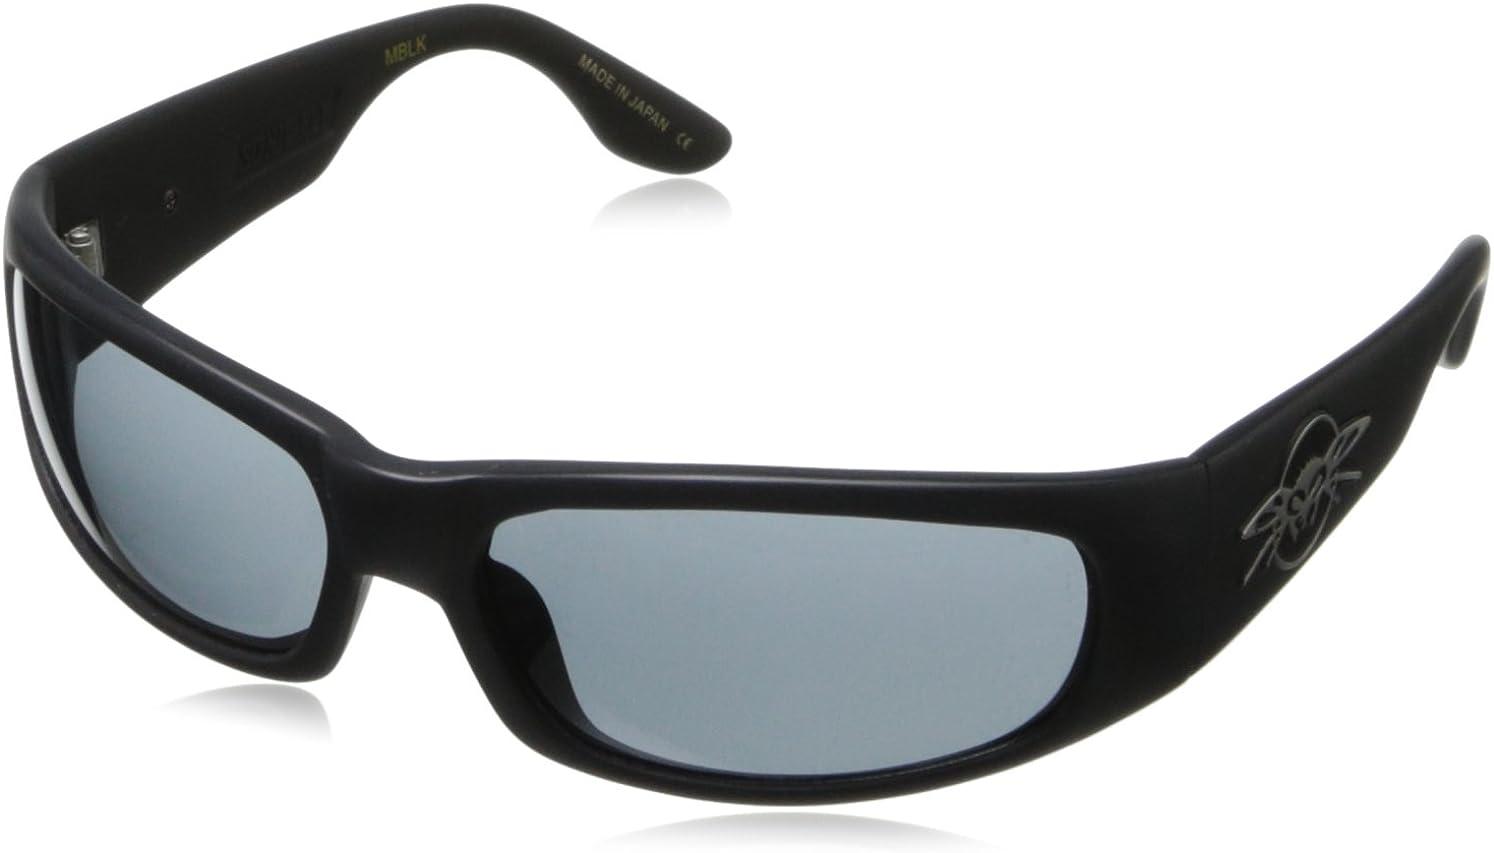 Black Omaha Mall Flys Save money Sonic Fly Wrap Sunglasses